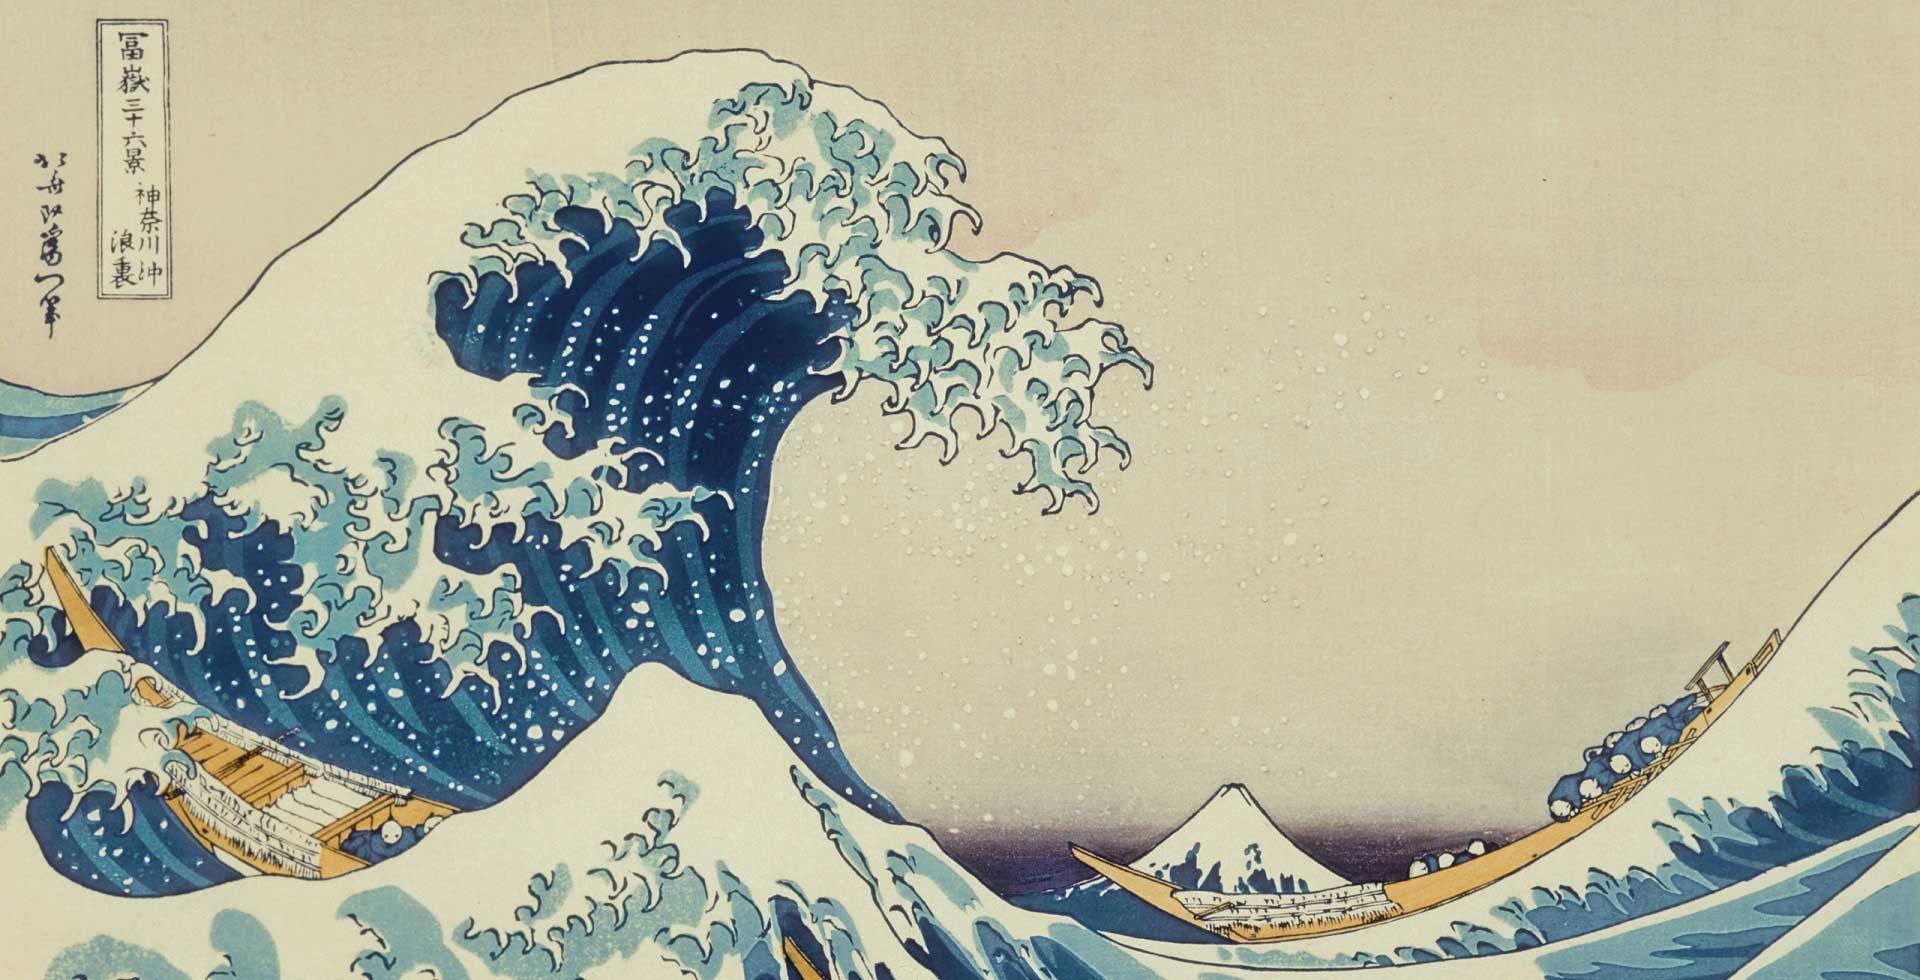 greatwave1.jpg (1920×980) Artwork, Hokusai, Japanese art